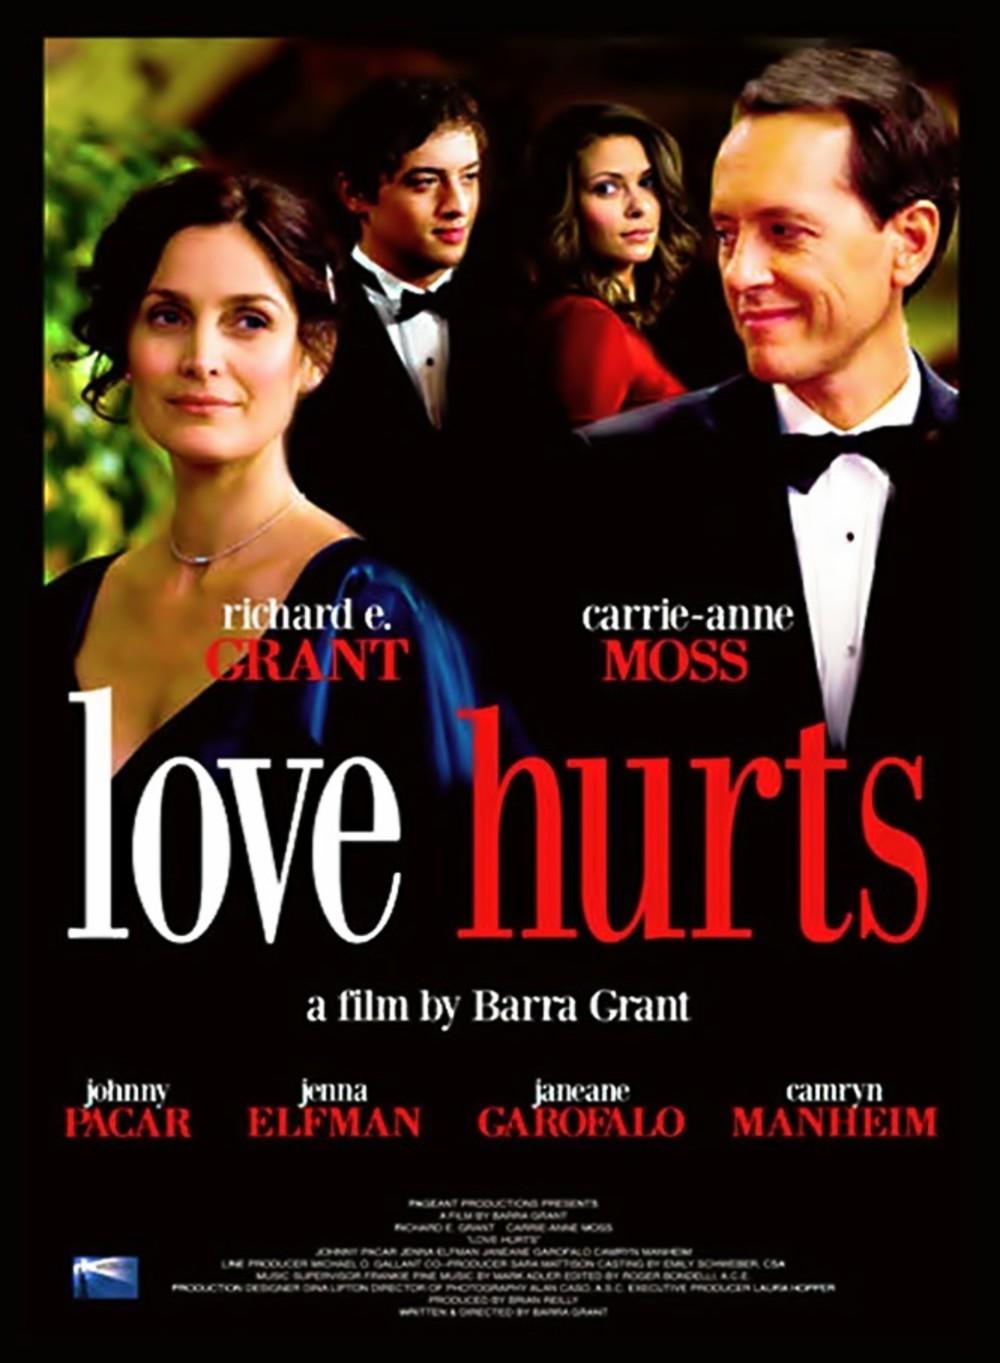 affiche du film Love Hurts